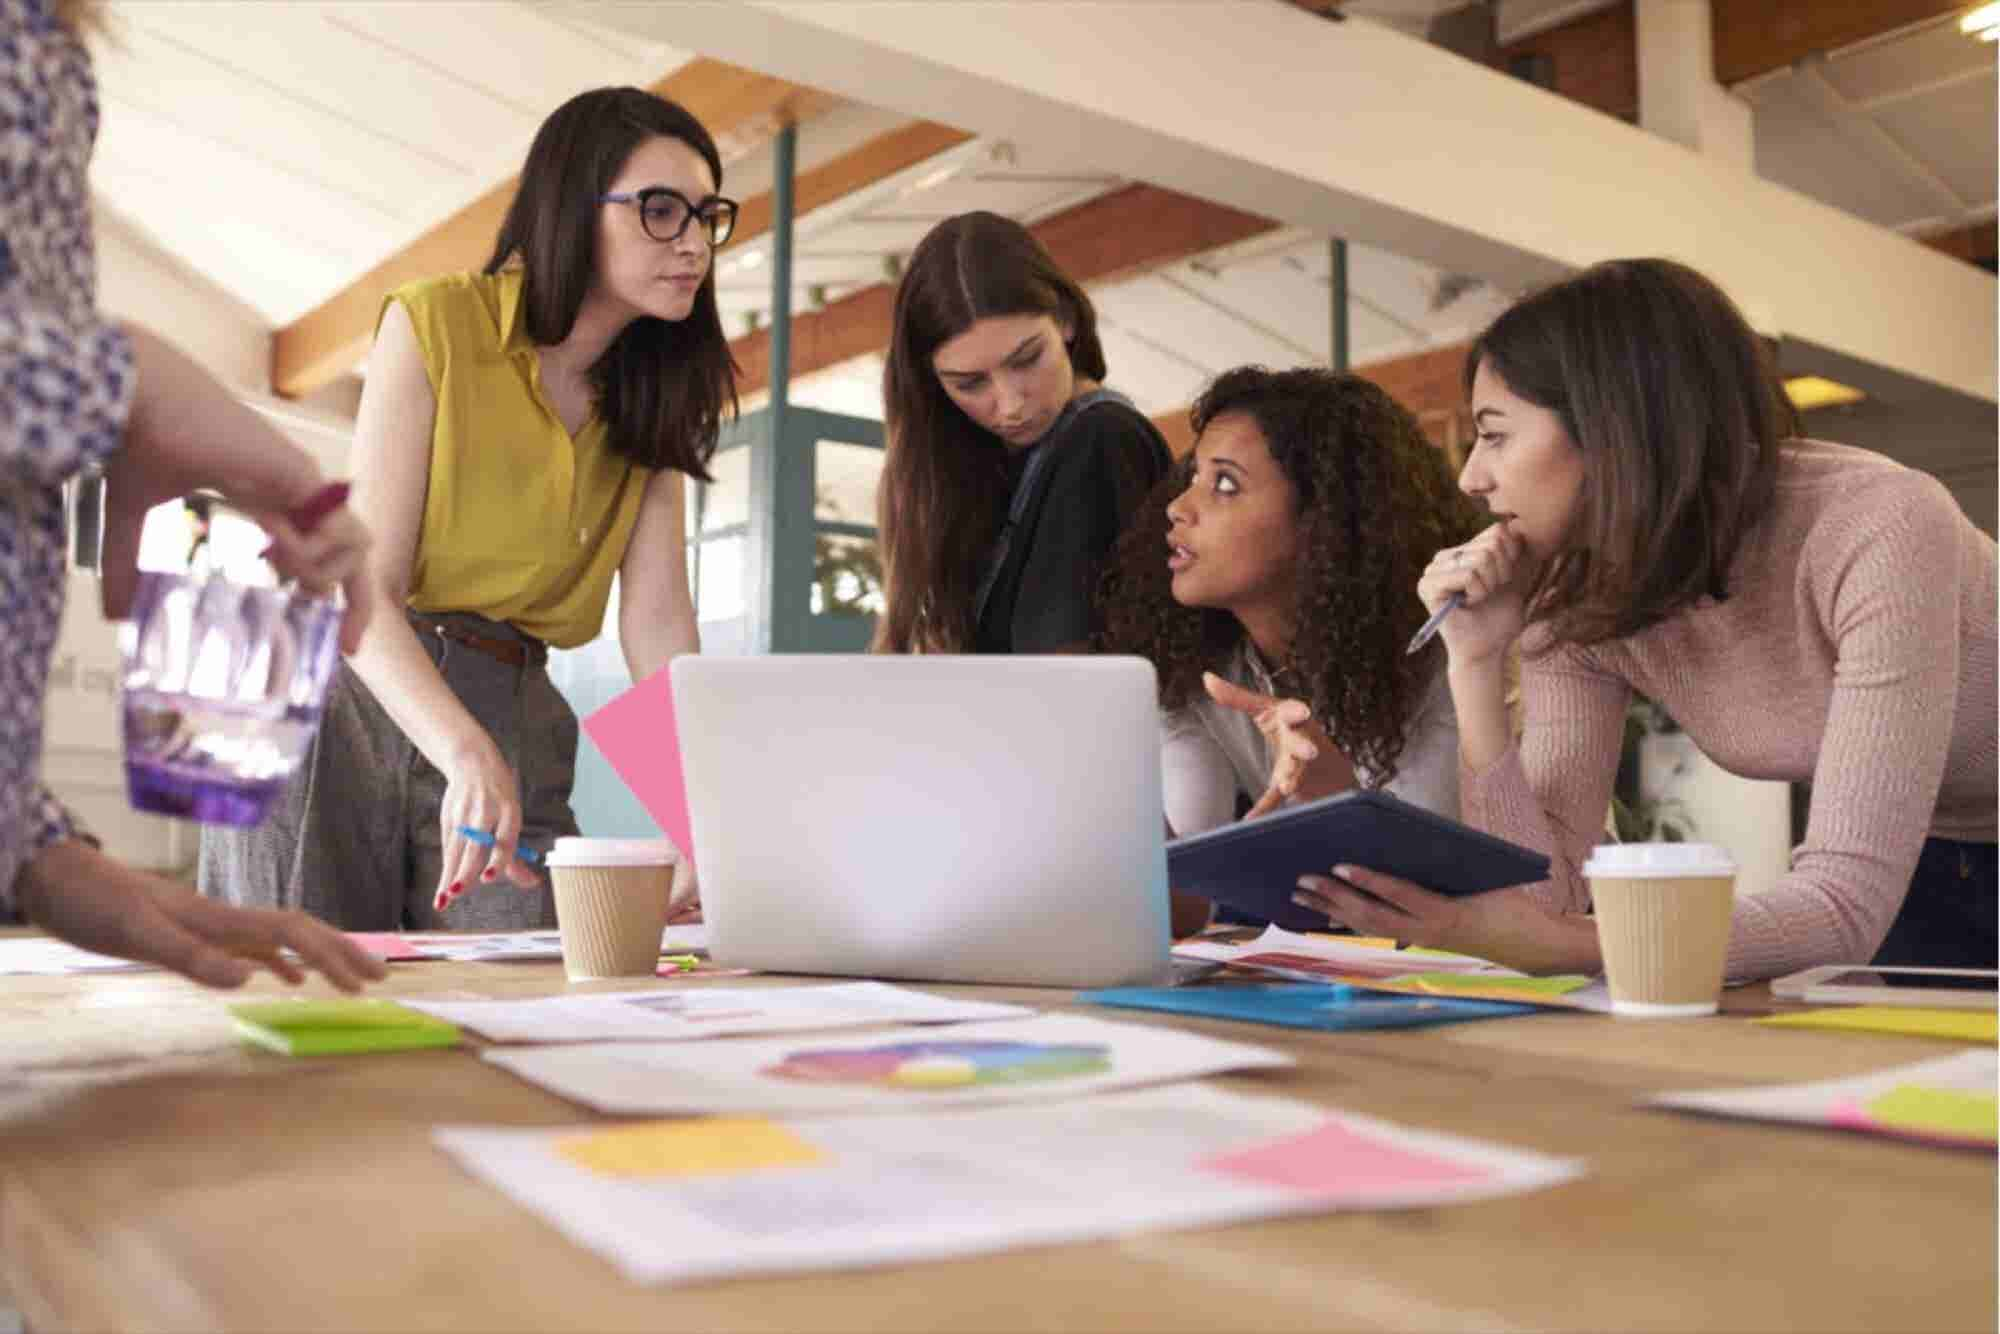 #Shepreneurs: These 3 Key Parameters Are Bridging the Gender Gap in Board Room